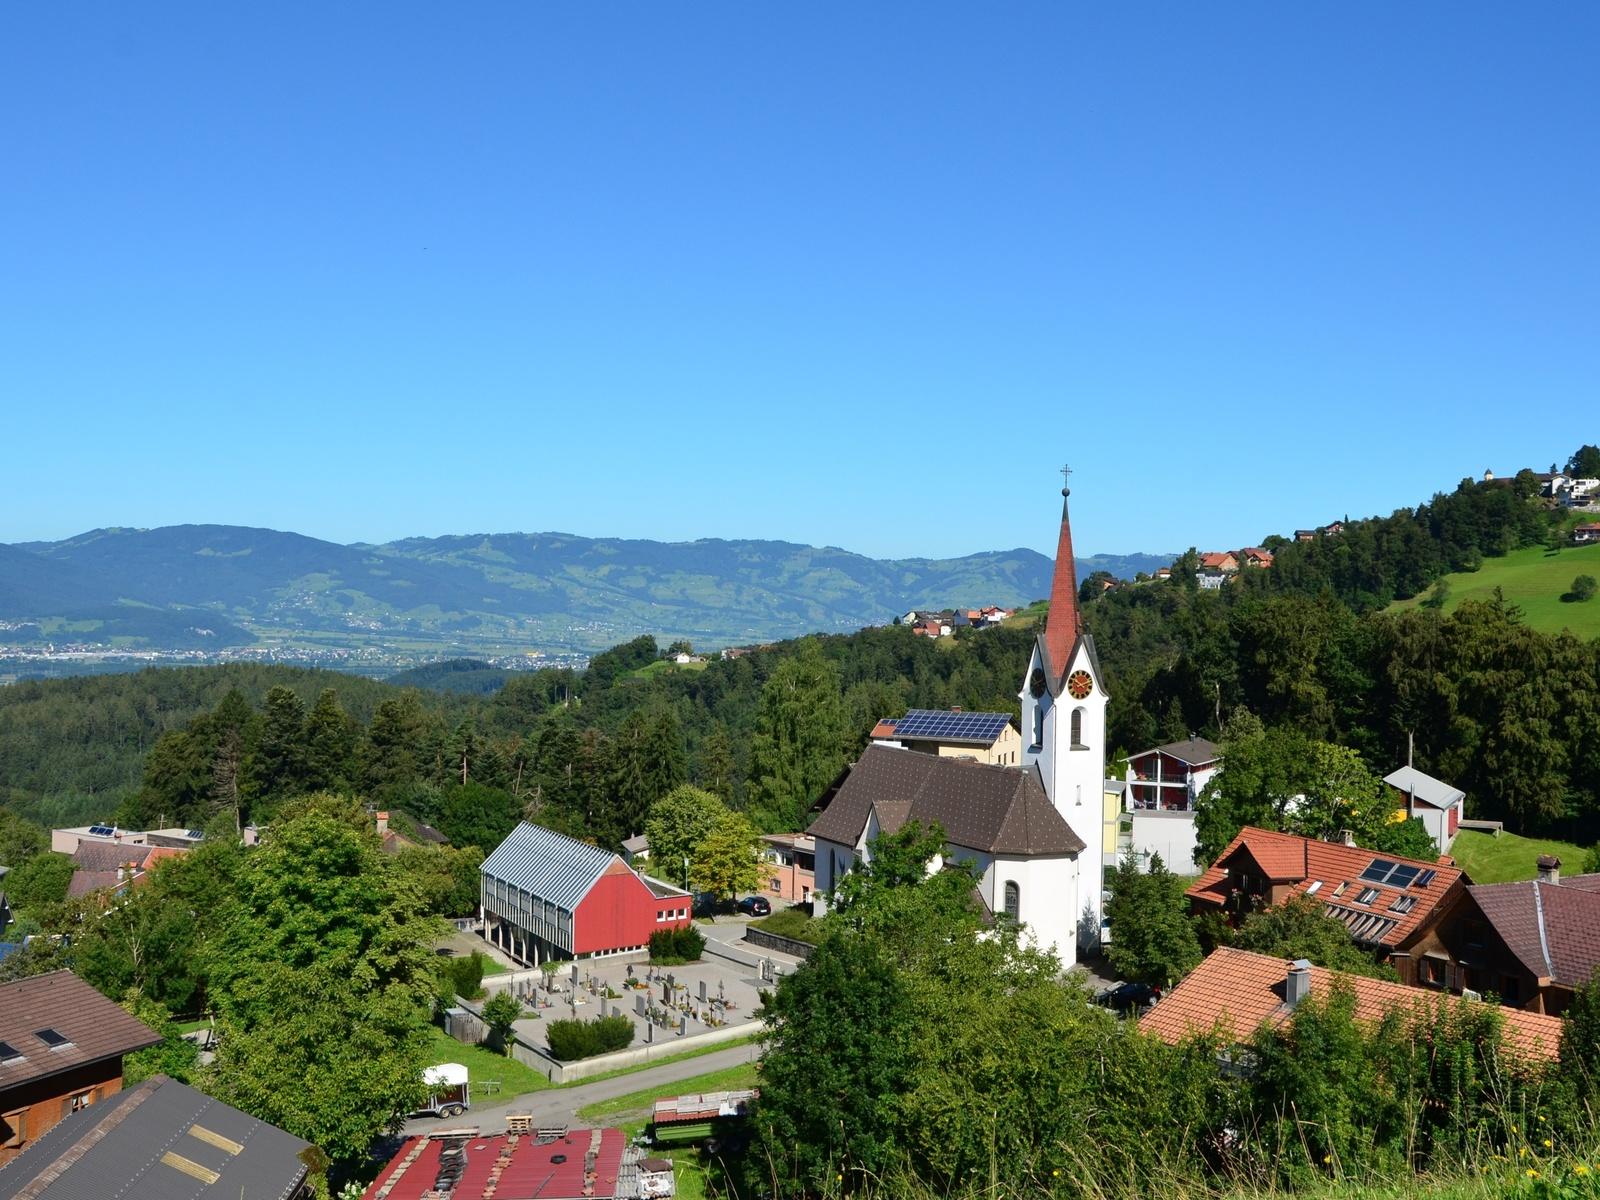 деревня, холмы, церковь